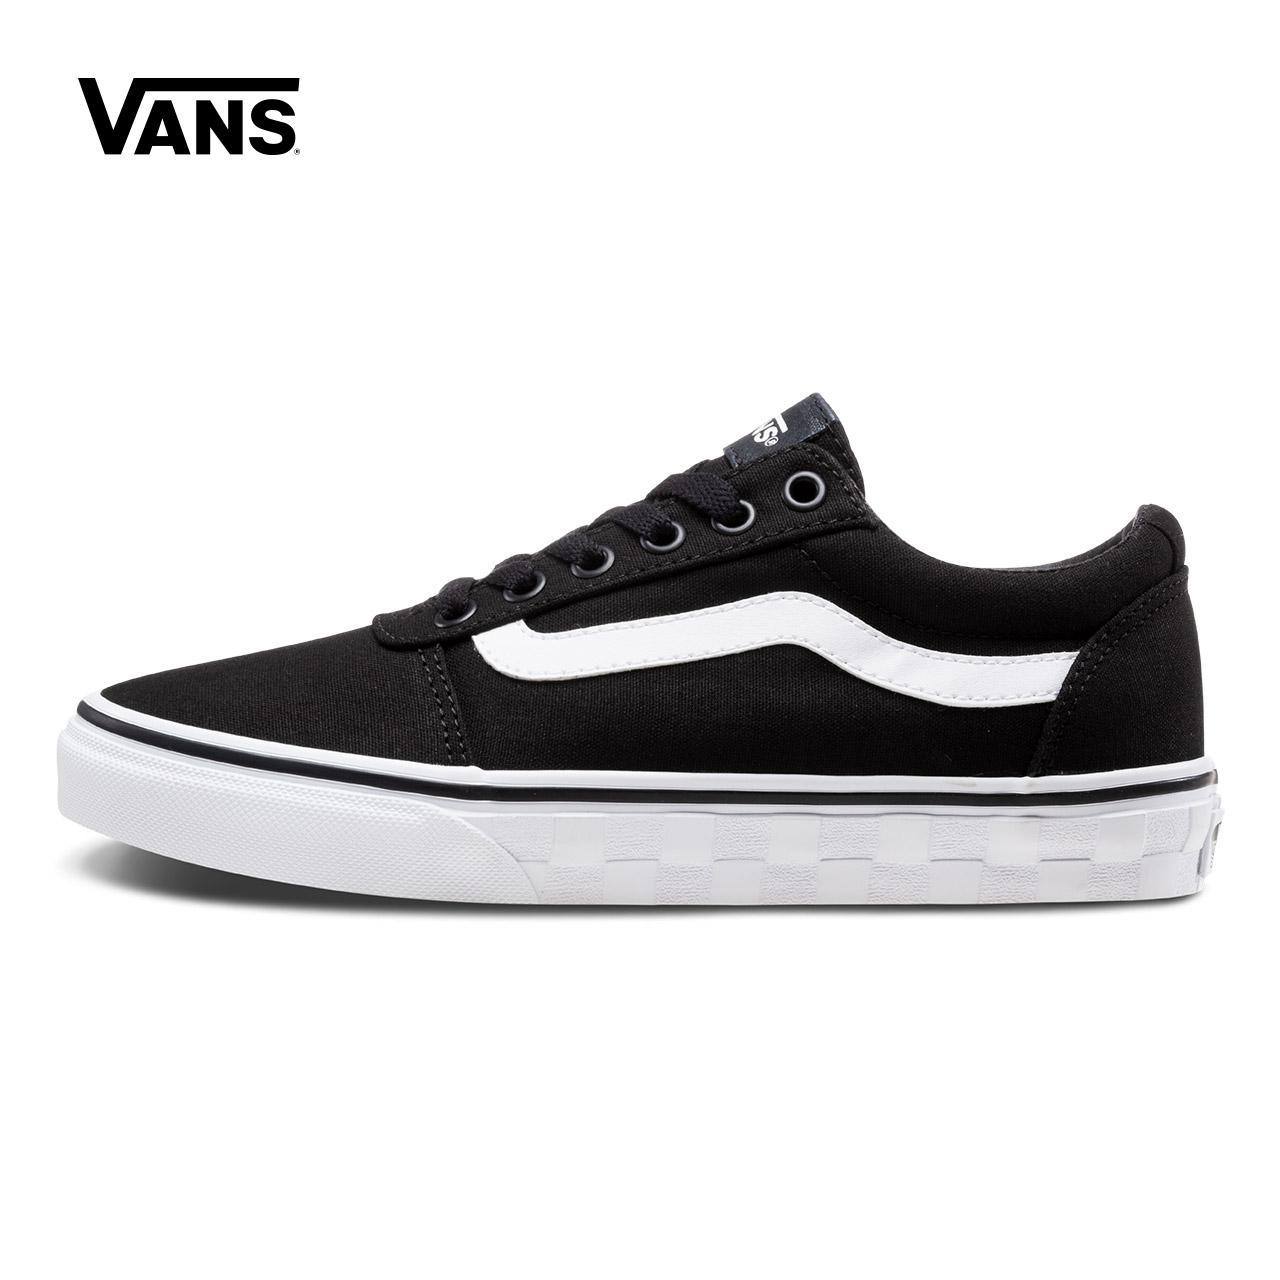 Vans 范斯官方女款侧边条纹板鞋|VN0A3TLAUFO-UFP